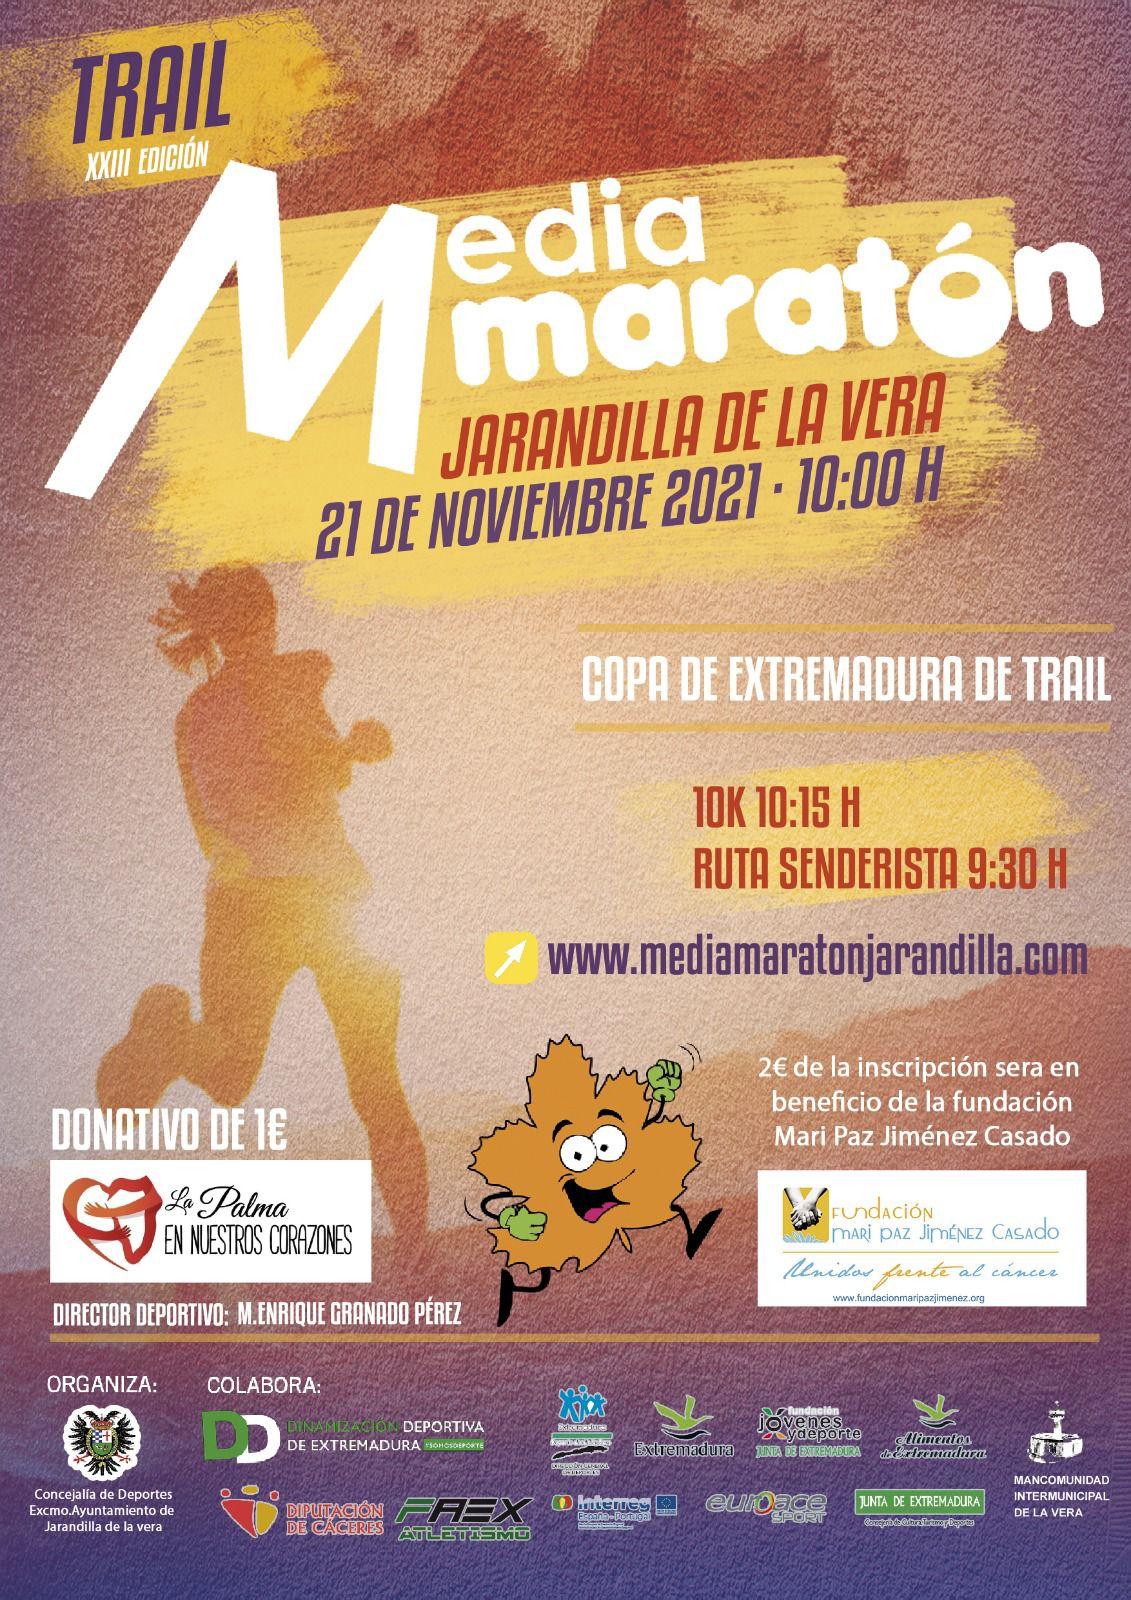 Media Maraton Jarandilla 2021